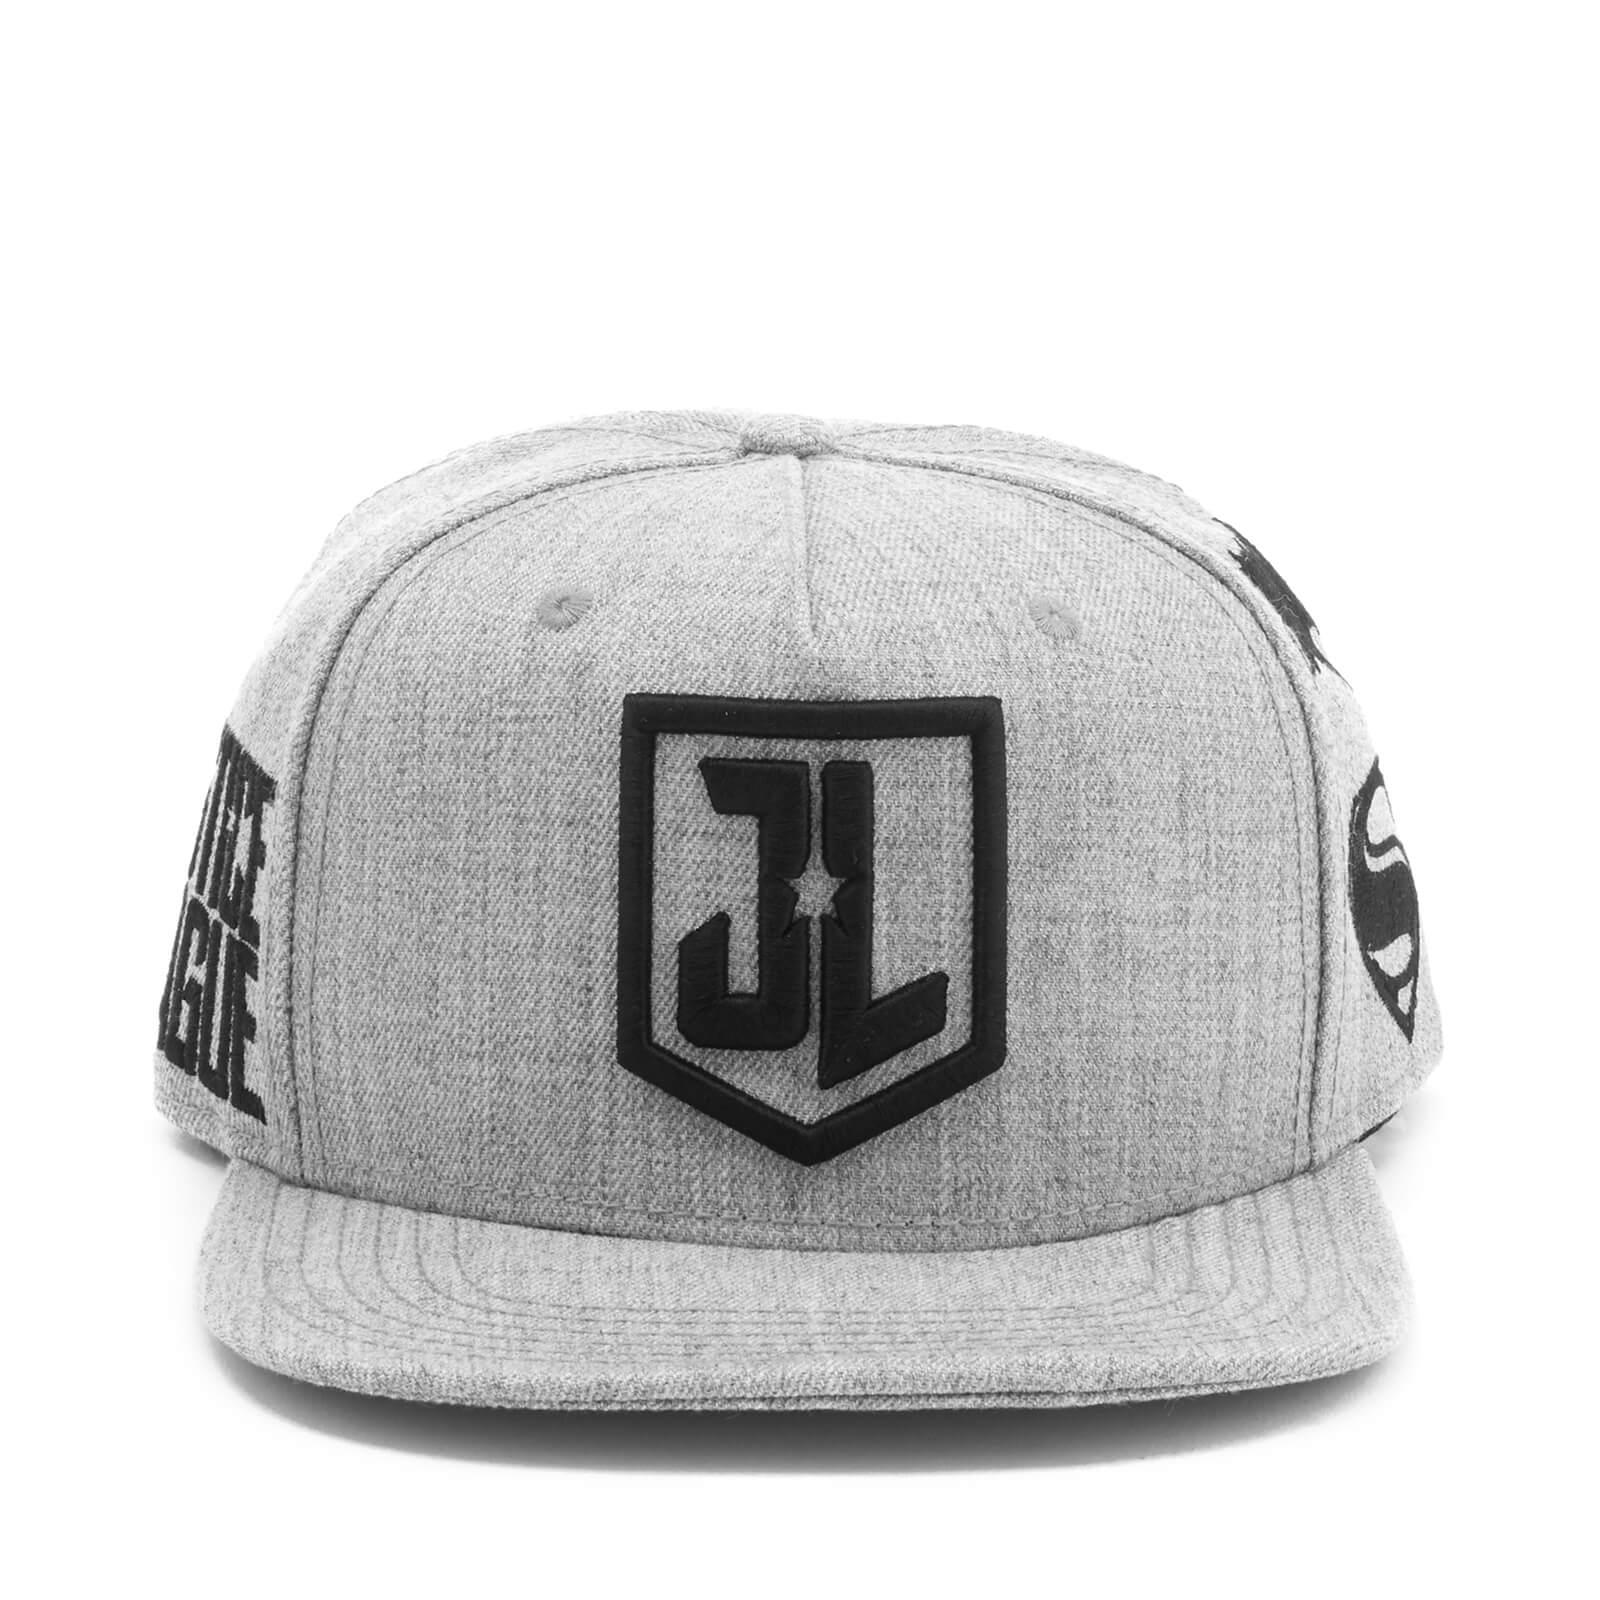 d90151b5abda7 DC Comics Justice League Men s Embroidery Logo Cap - Grey Merchandise